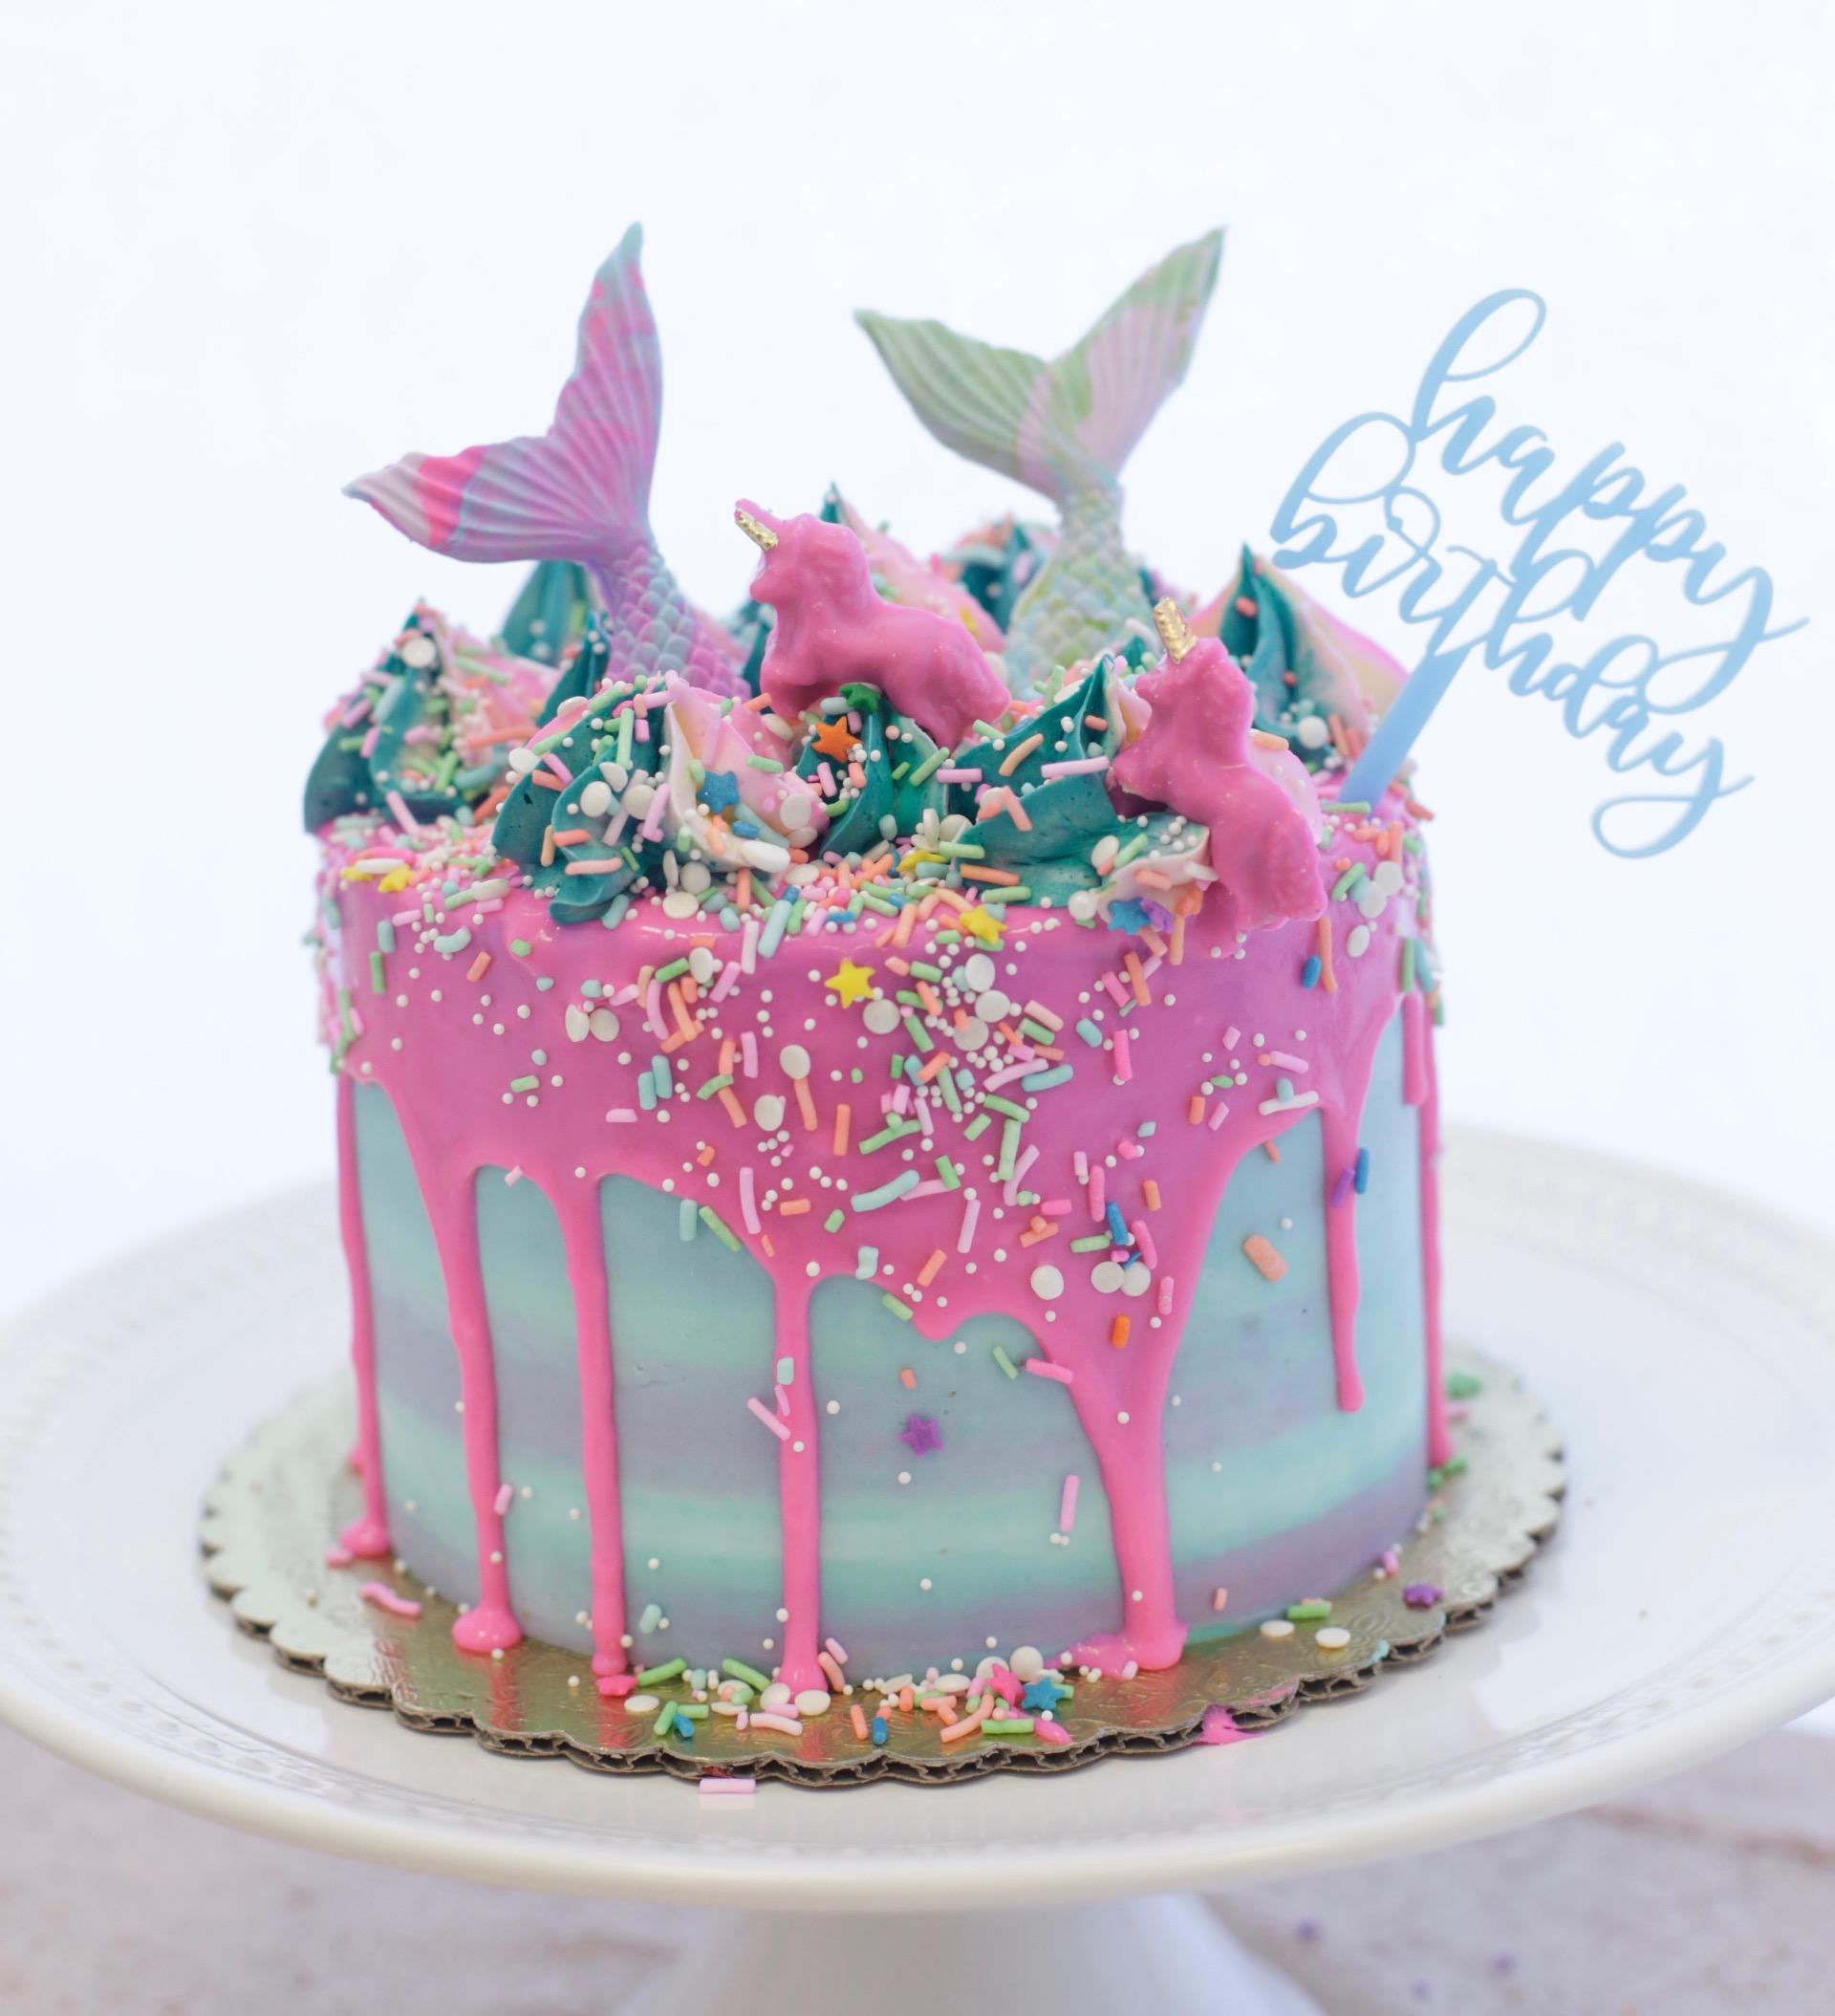 The Trendiest Kids Birthday Cakes On Instagram Sheknows